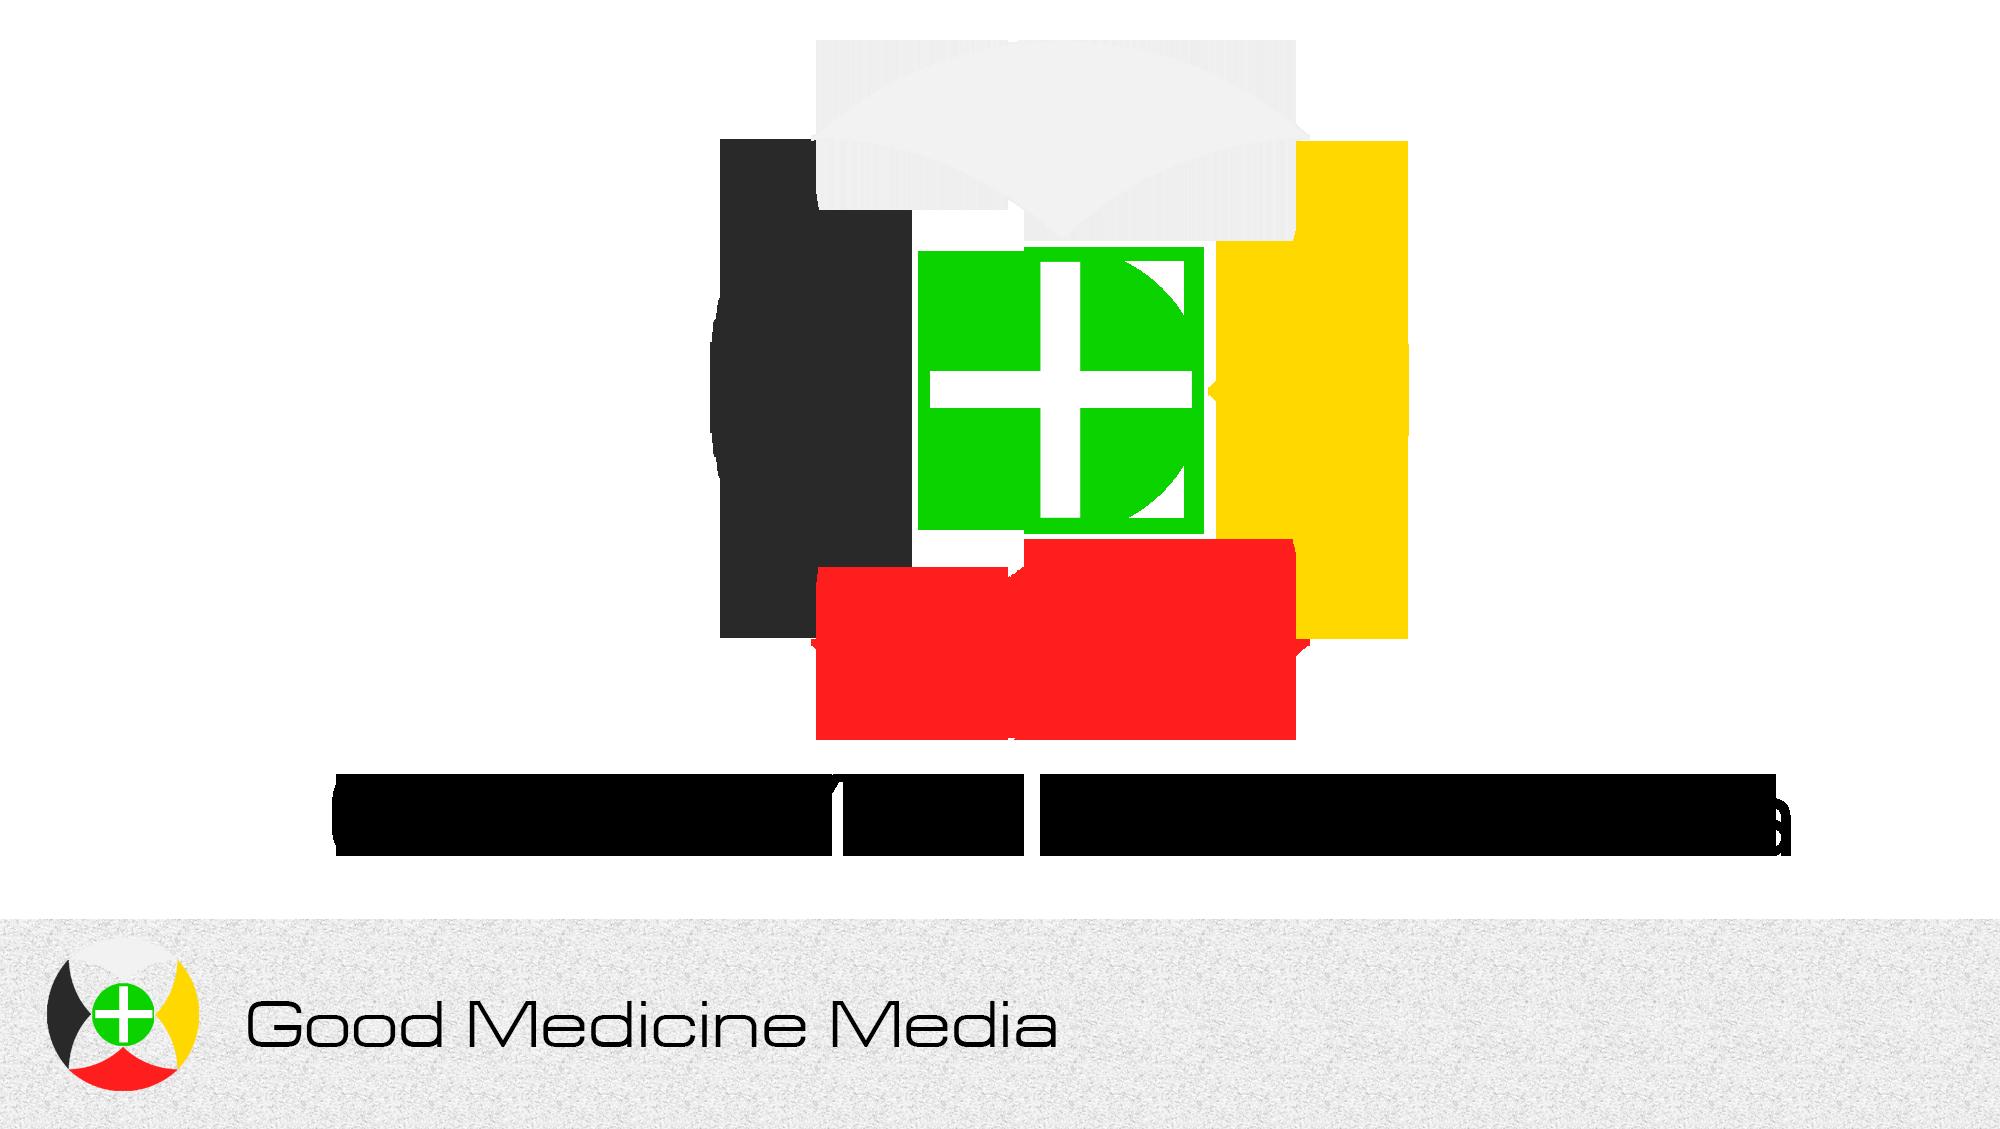 Logo Design by Private User - Entry No. 201 in the Logo Design Contest Good Medicine Media Logo Design.